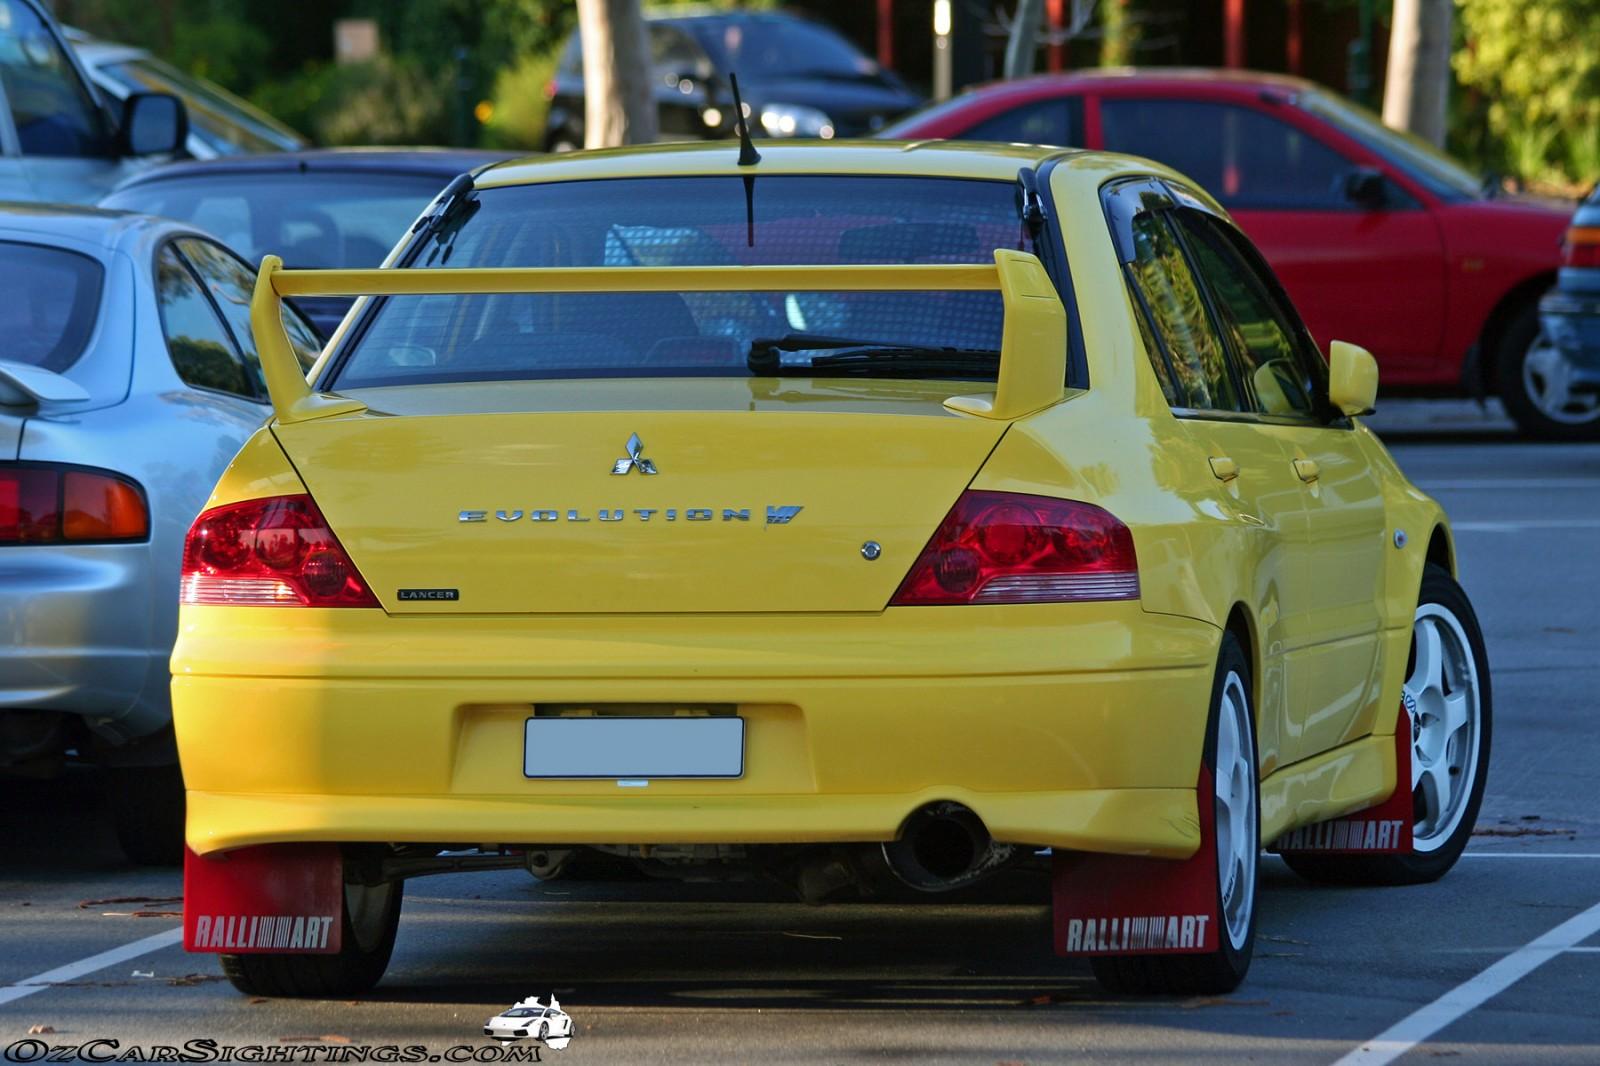 Der 2010 Ford Mustang ist noch : Raz's blog